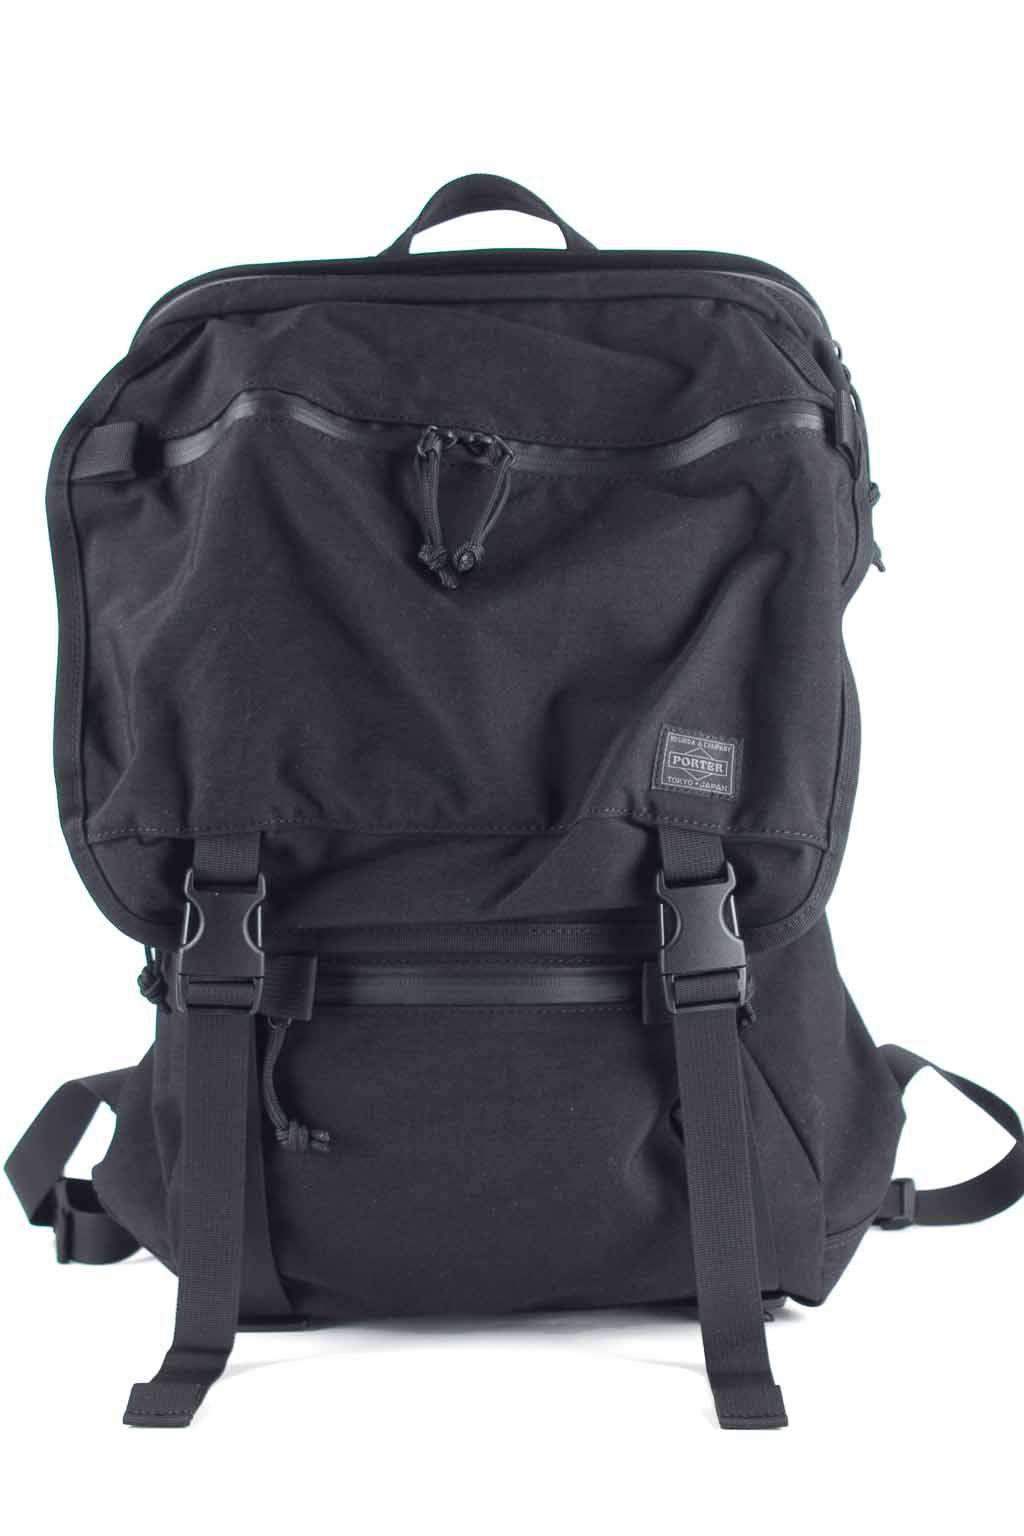 Porter Yoshida Porter - Klunkerz Daypack-Black  d813d6e510fd9